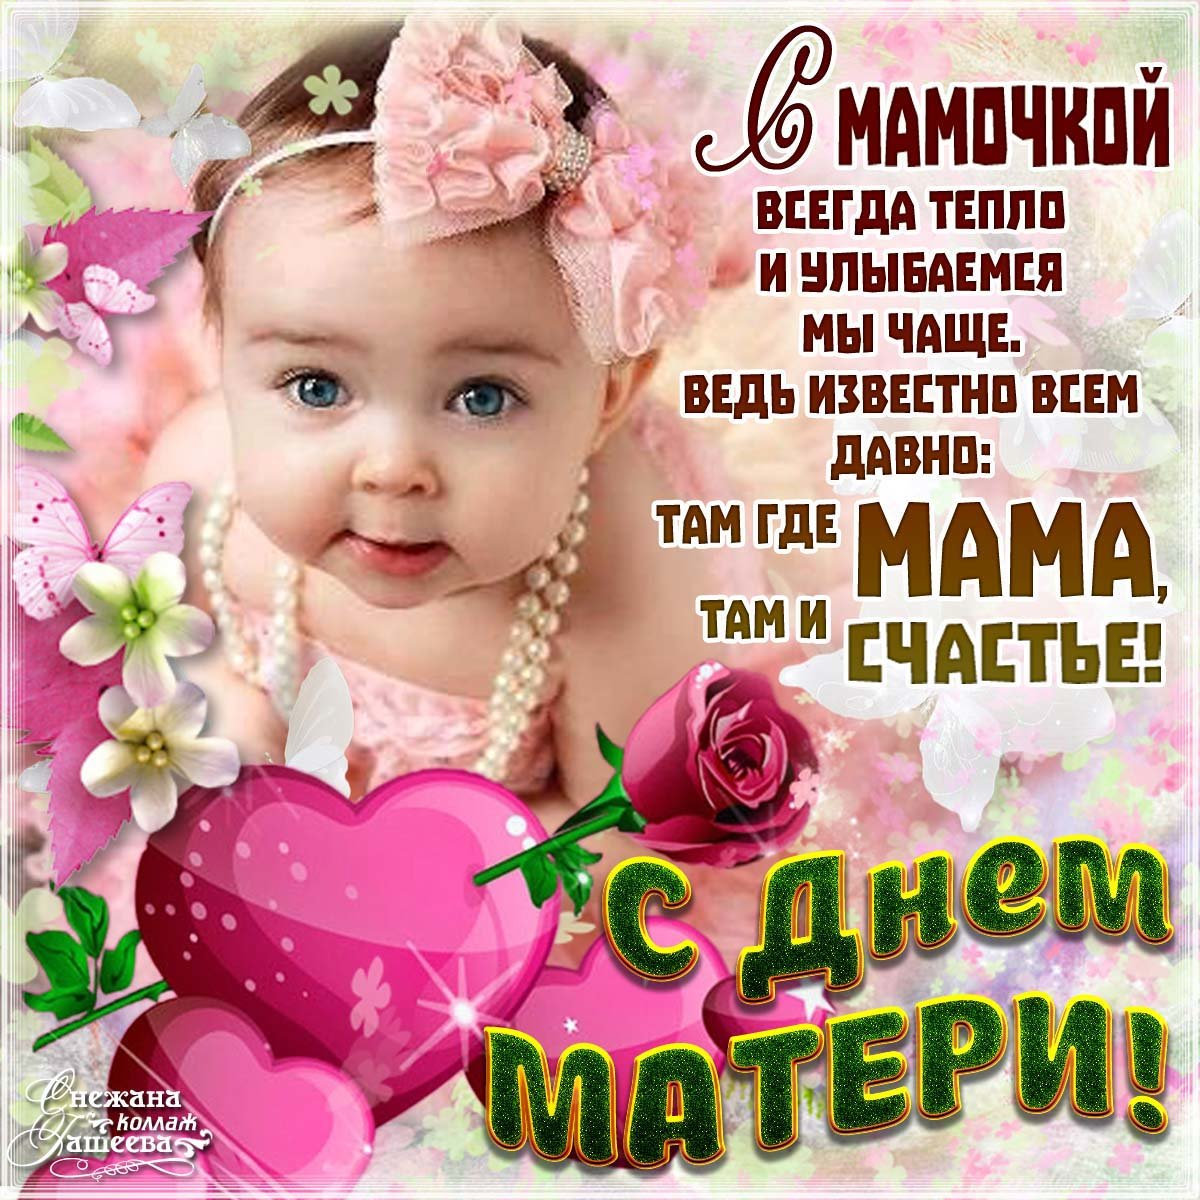 С днем матери поздравления и картинки